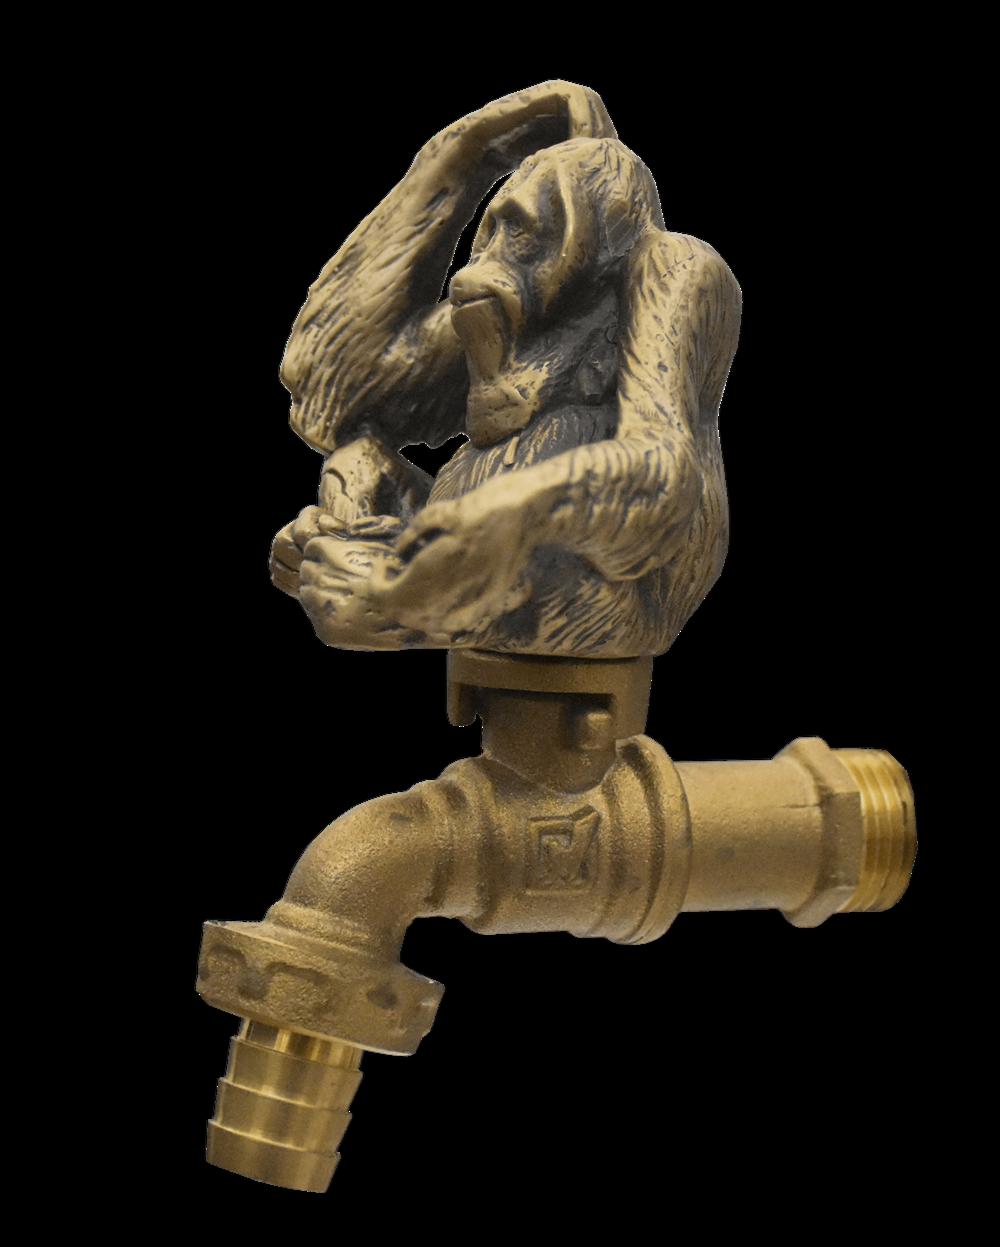 Brass Garden Tap Monkey Spigot Faucet Vintage Water Home Decor Living Outdoor